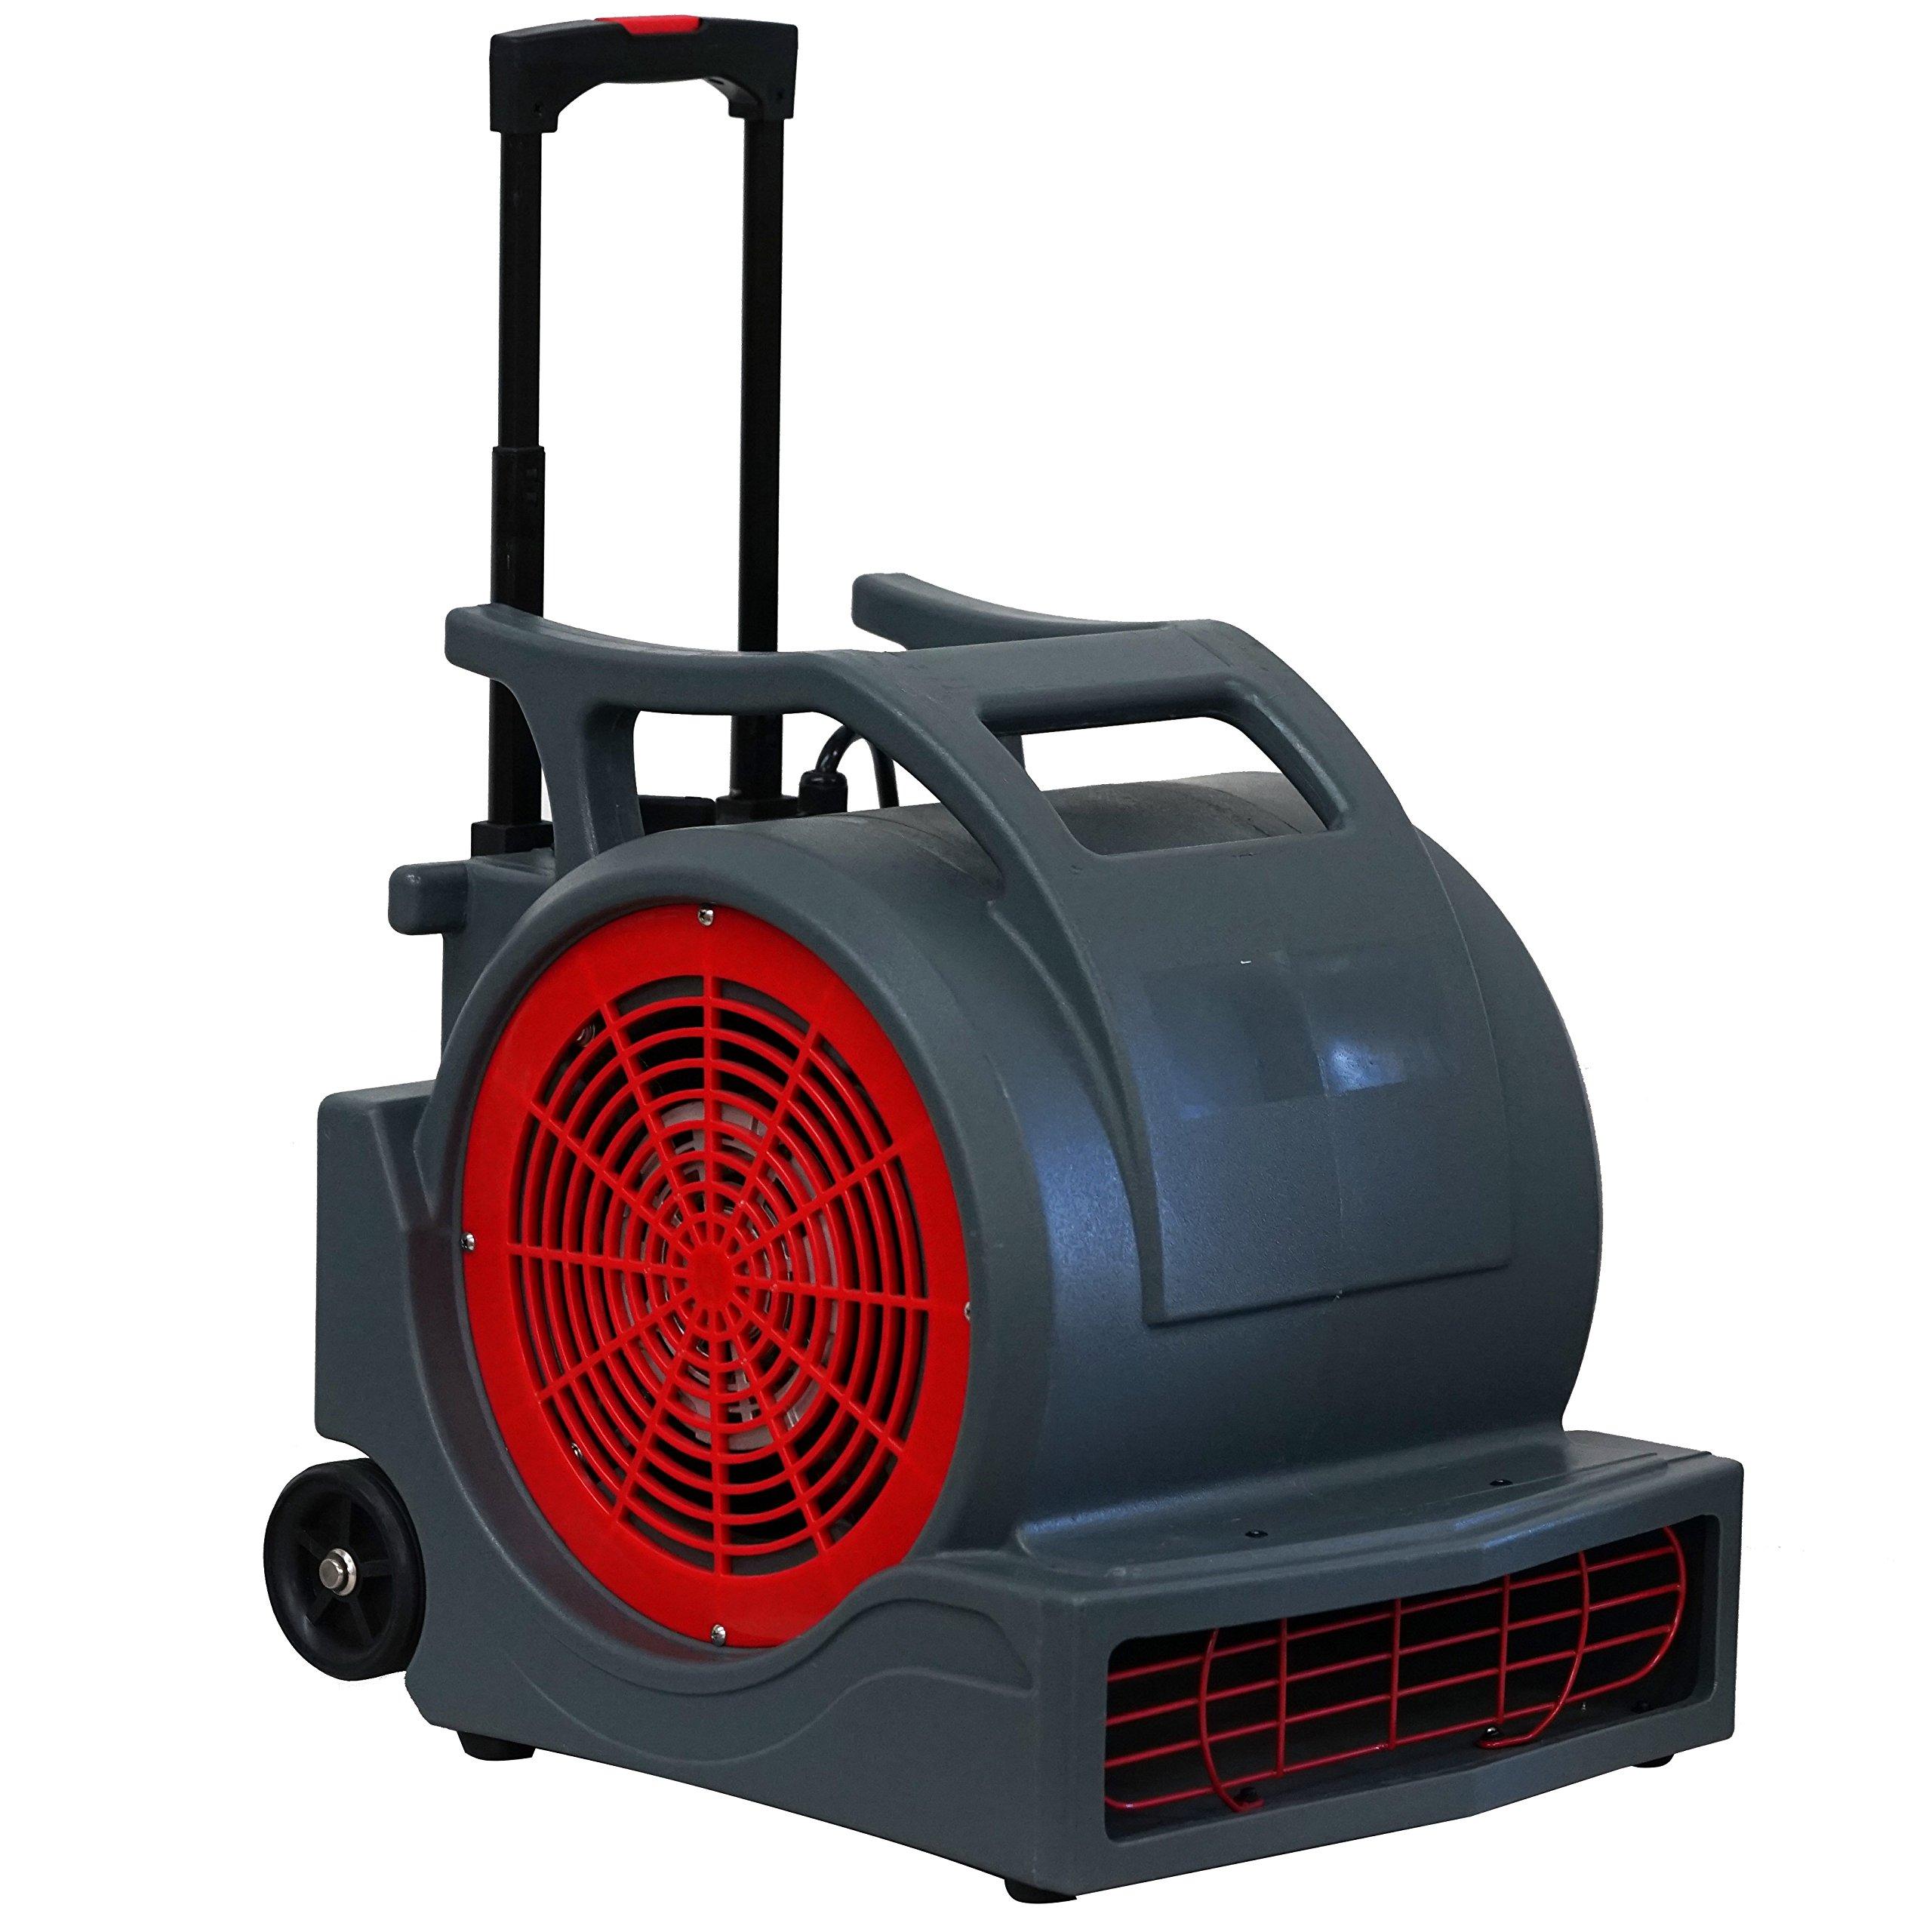 MOUNTO 3-Speed 1Hp 4000 Plus CFMfm Monster Air Mover Floor Carpet Dryers with Handle Wheelkit, Grey